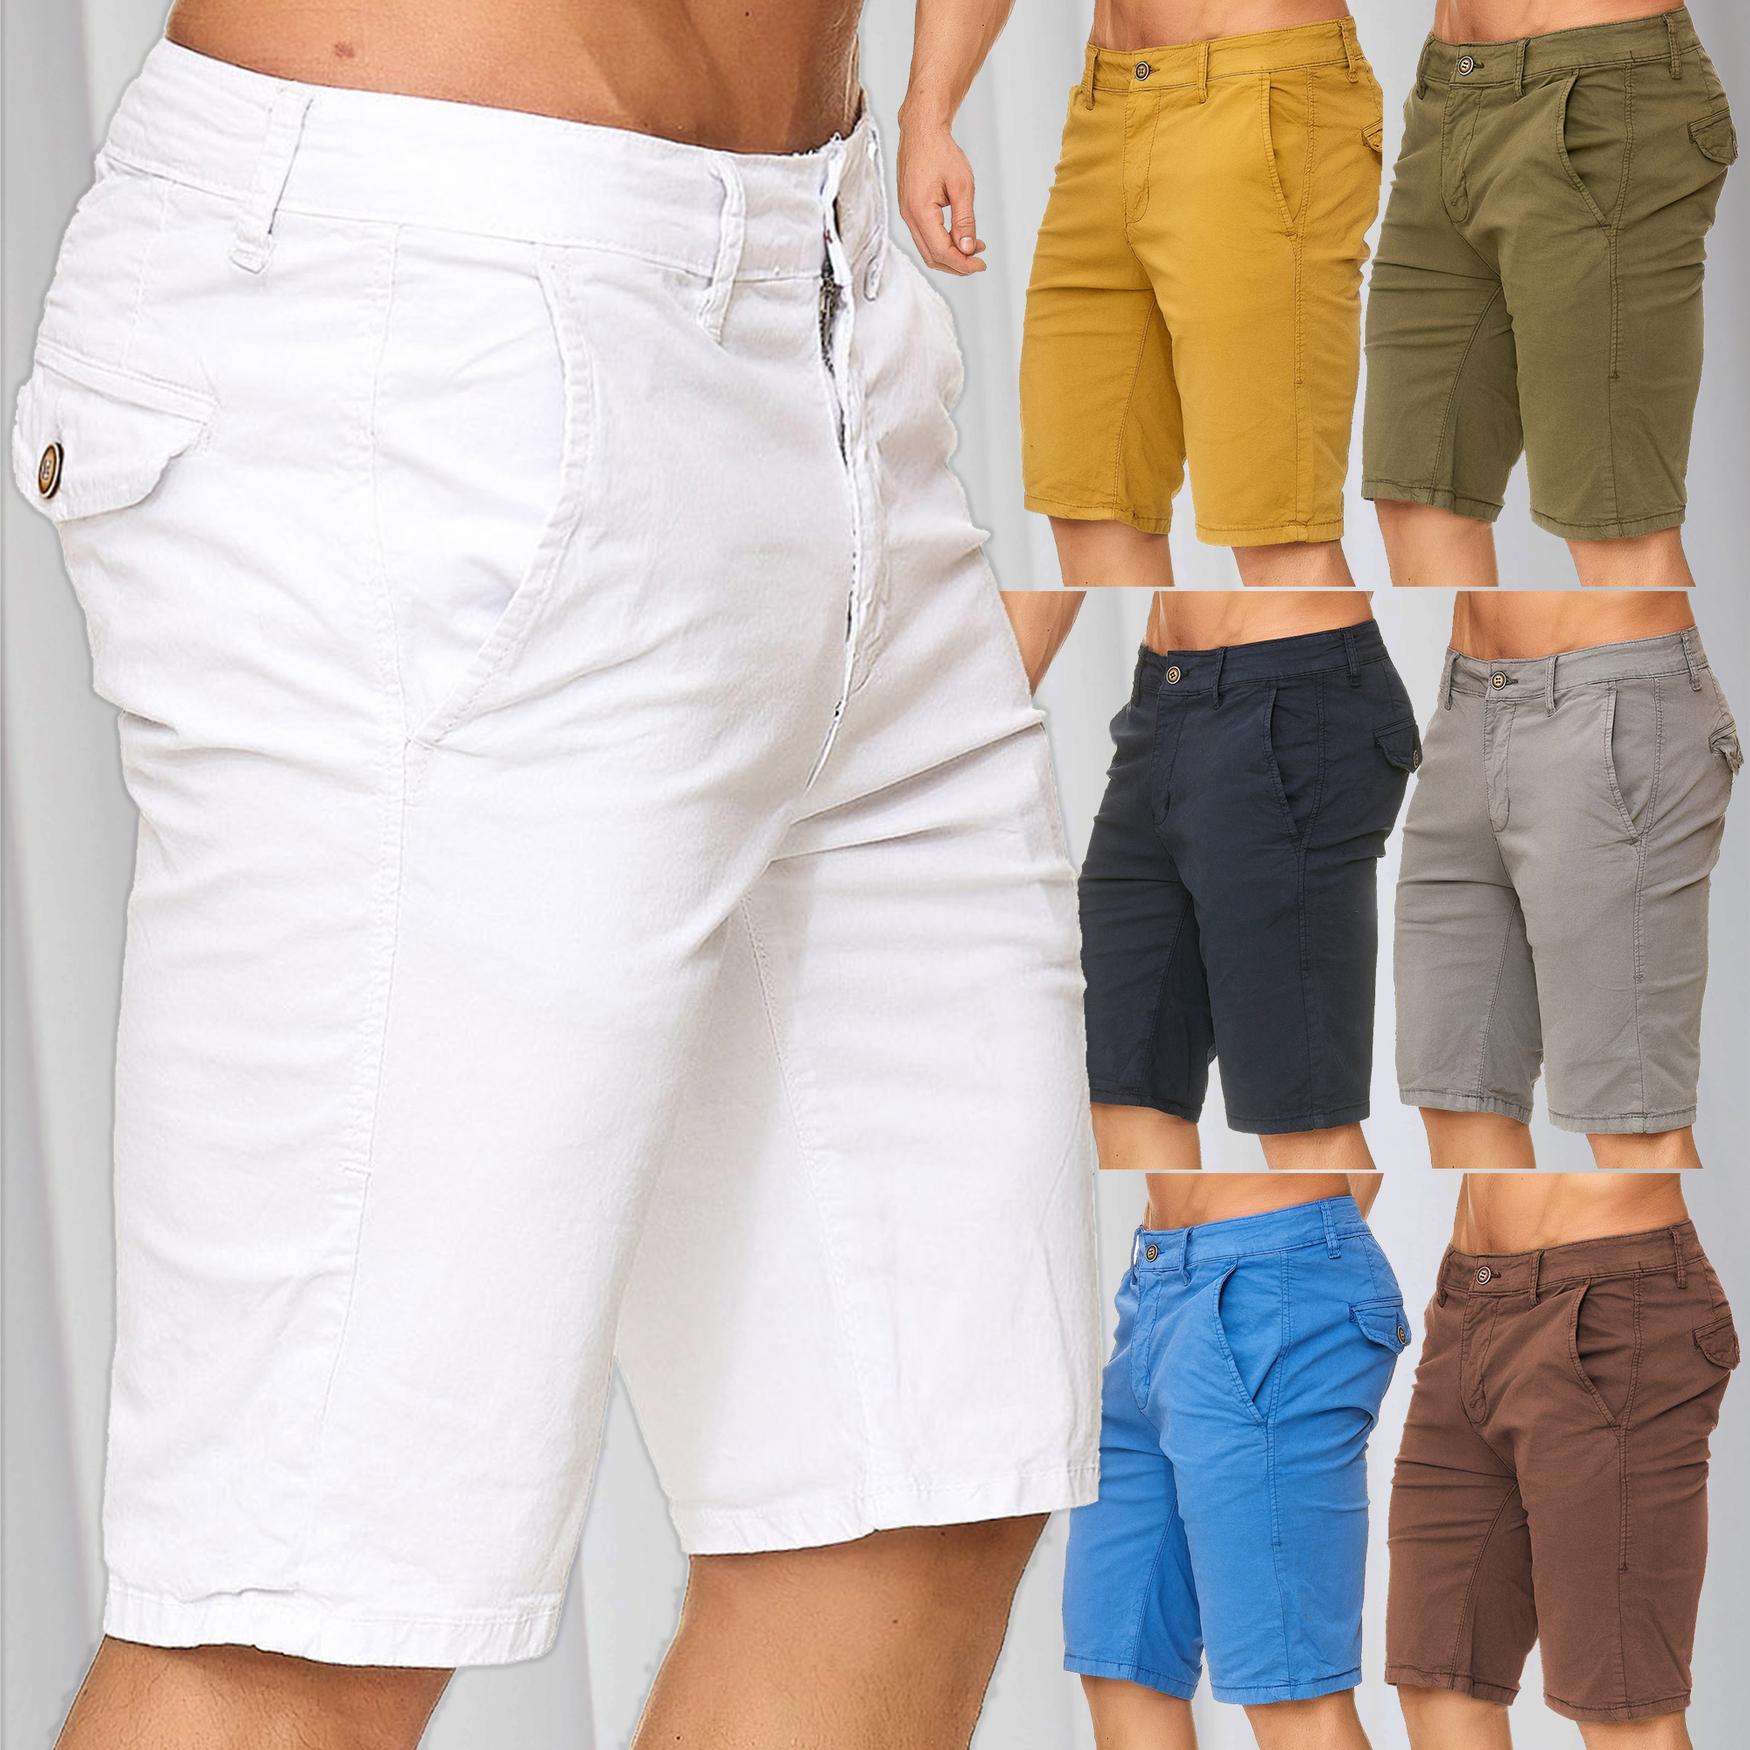 Men's Chino Shorts Summer Pants Bermuda short trousers designer casual  vintage   eBay